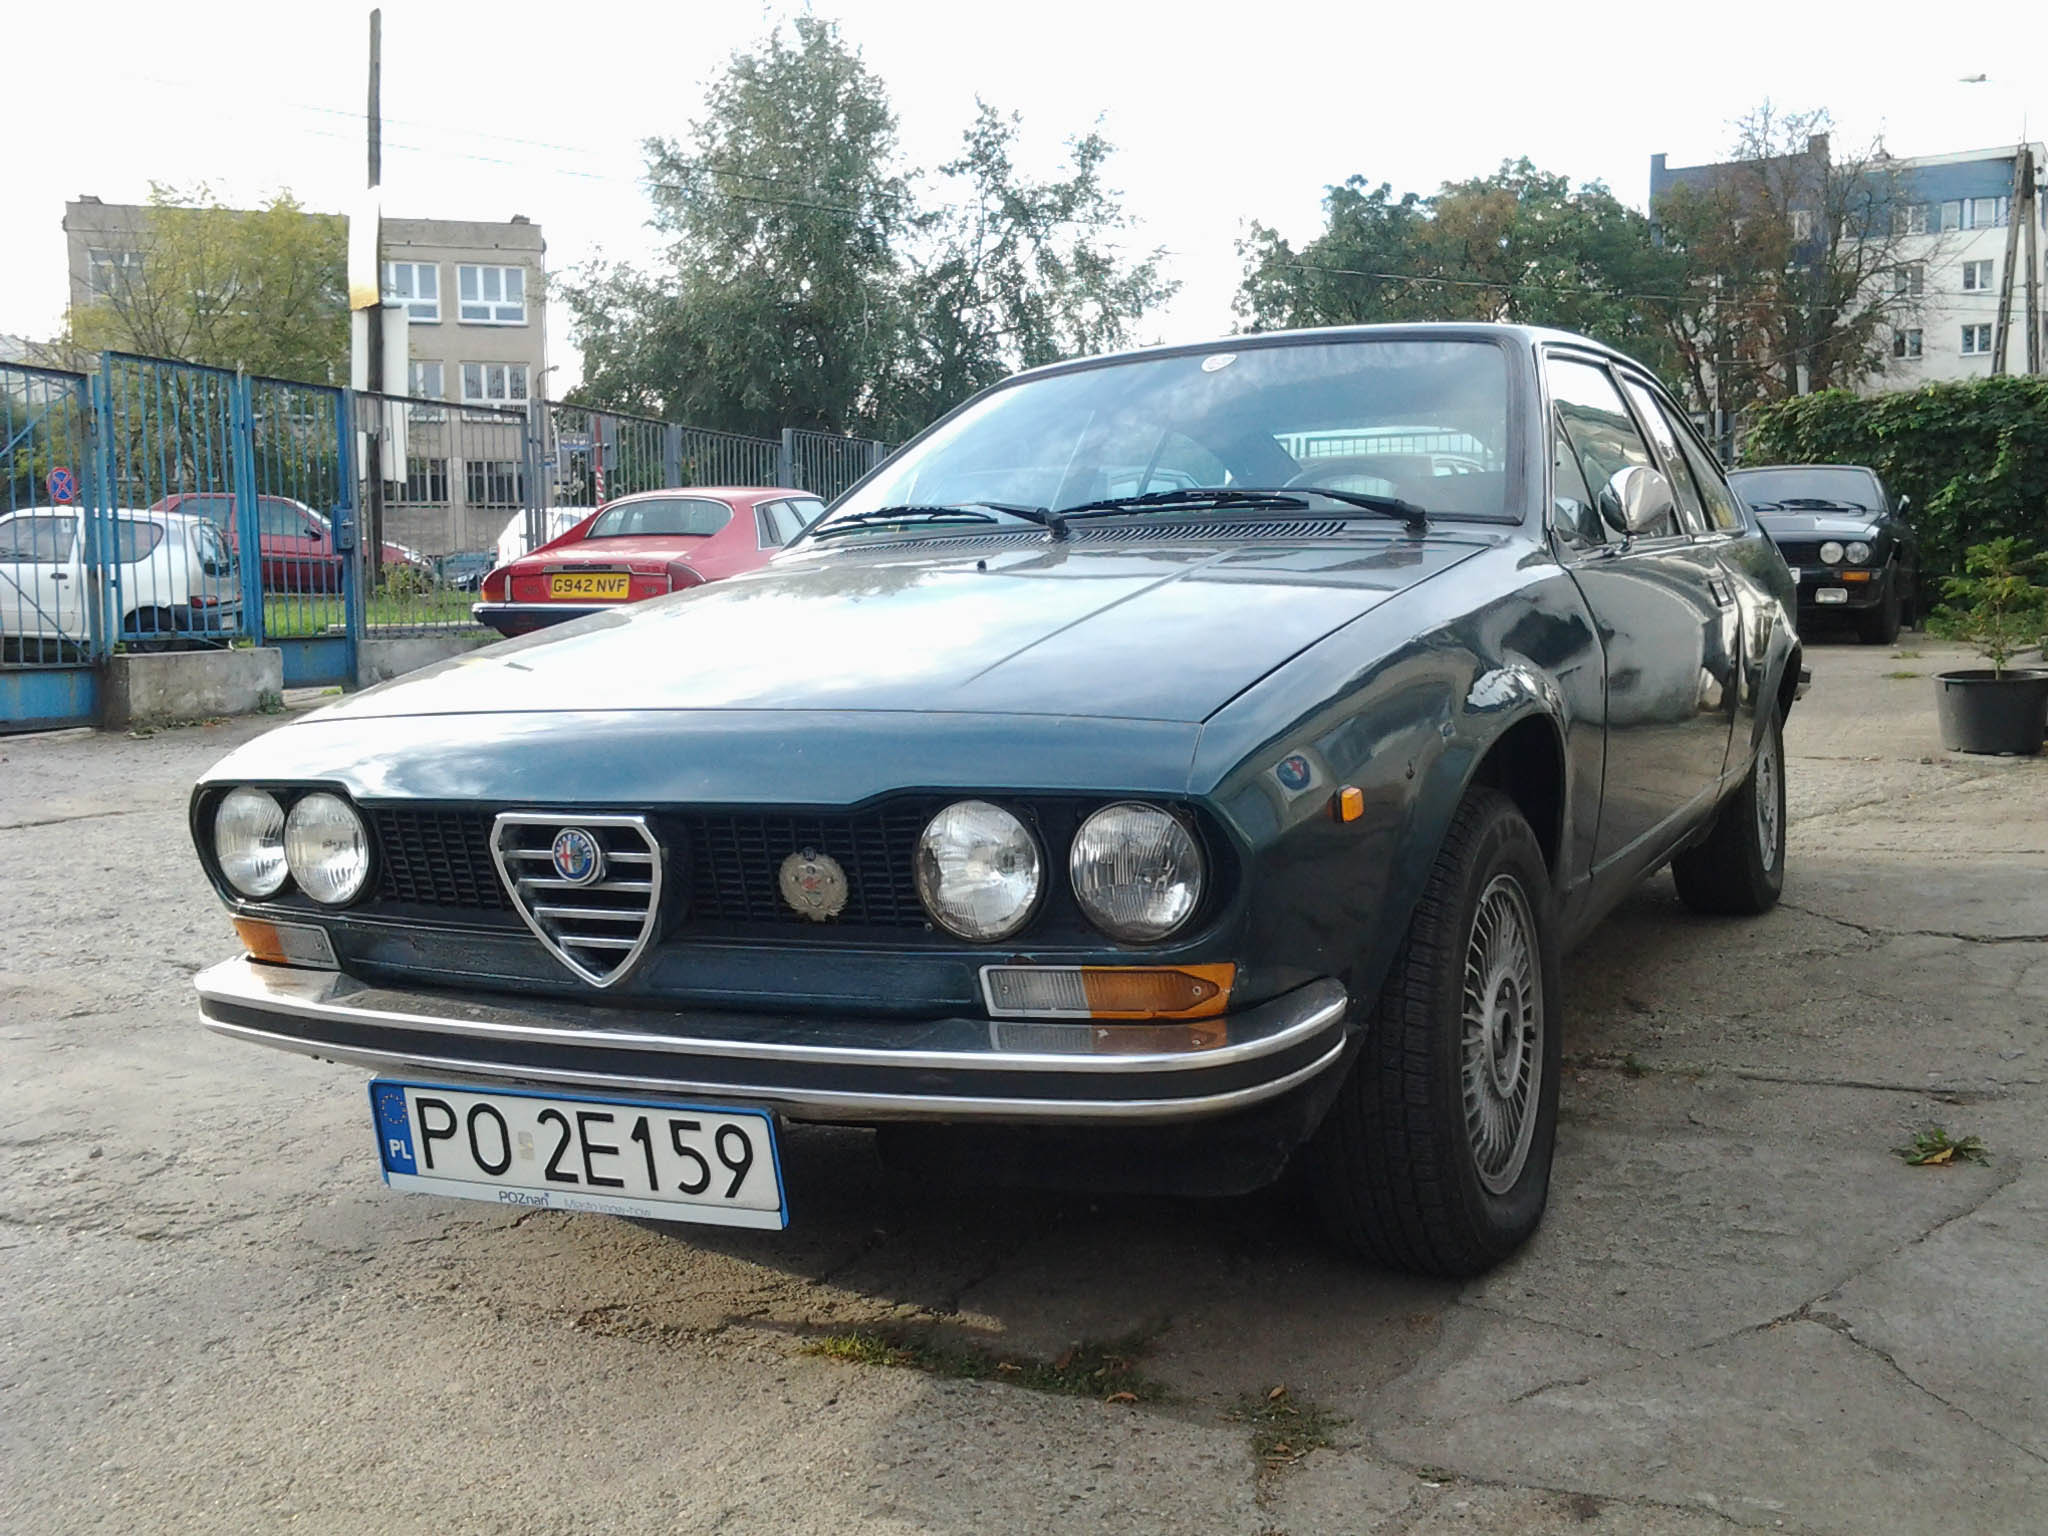 Car Show 2015 >> '74 Alfa Romeo Alfetta GT - Classic Car Restoration Center